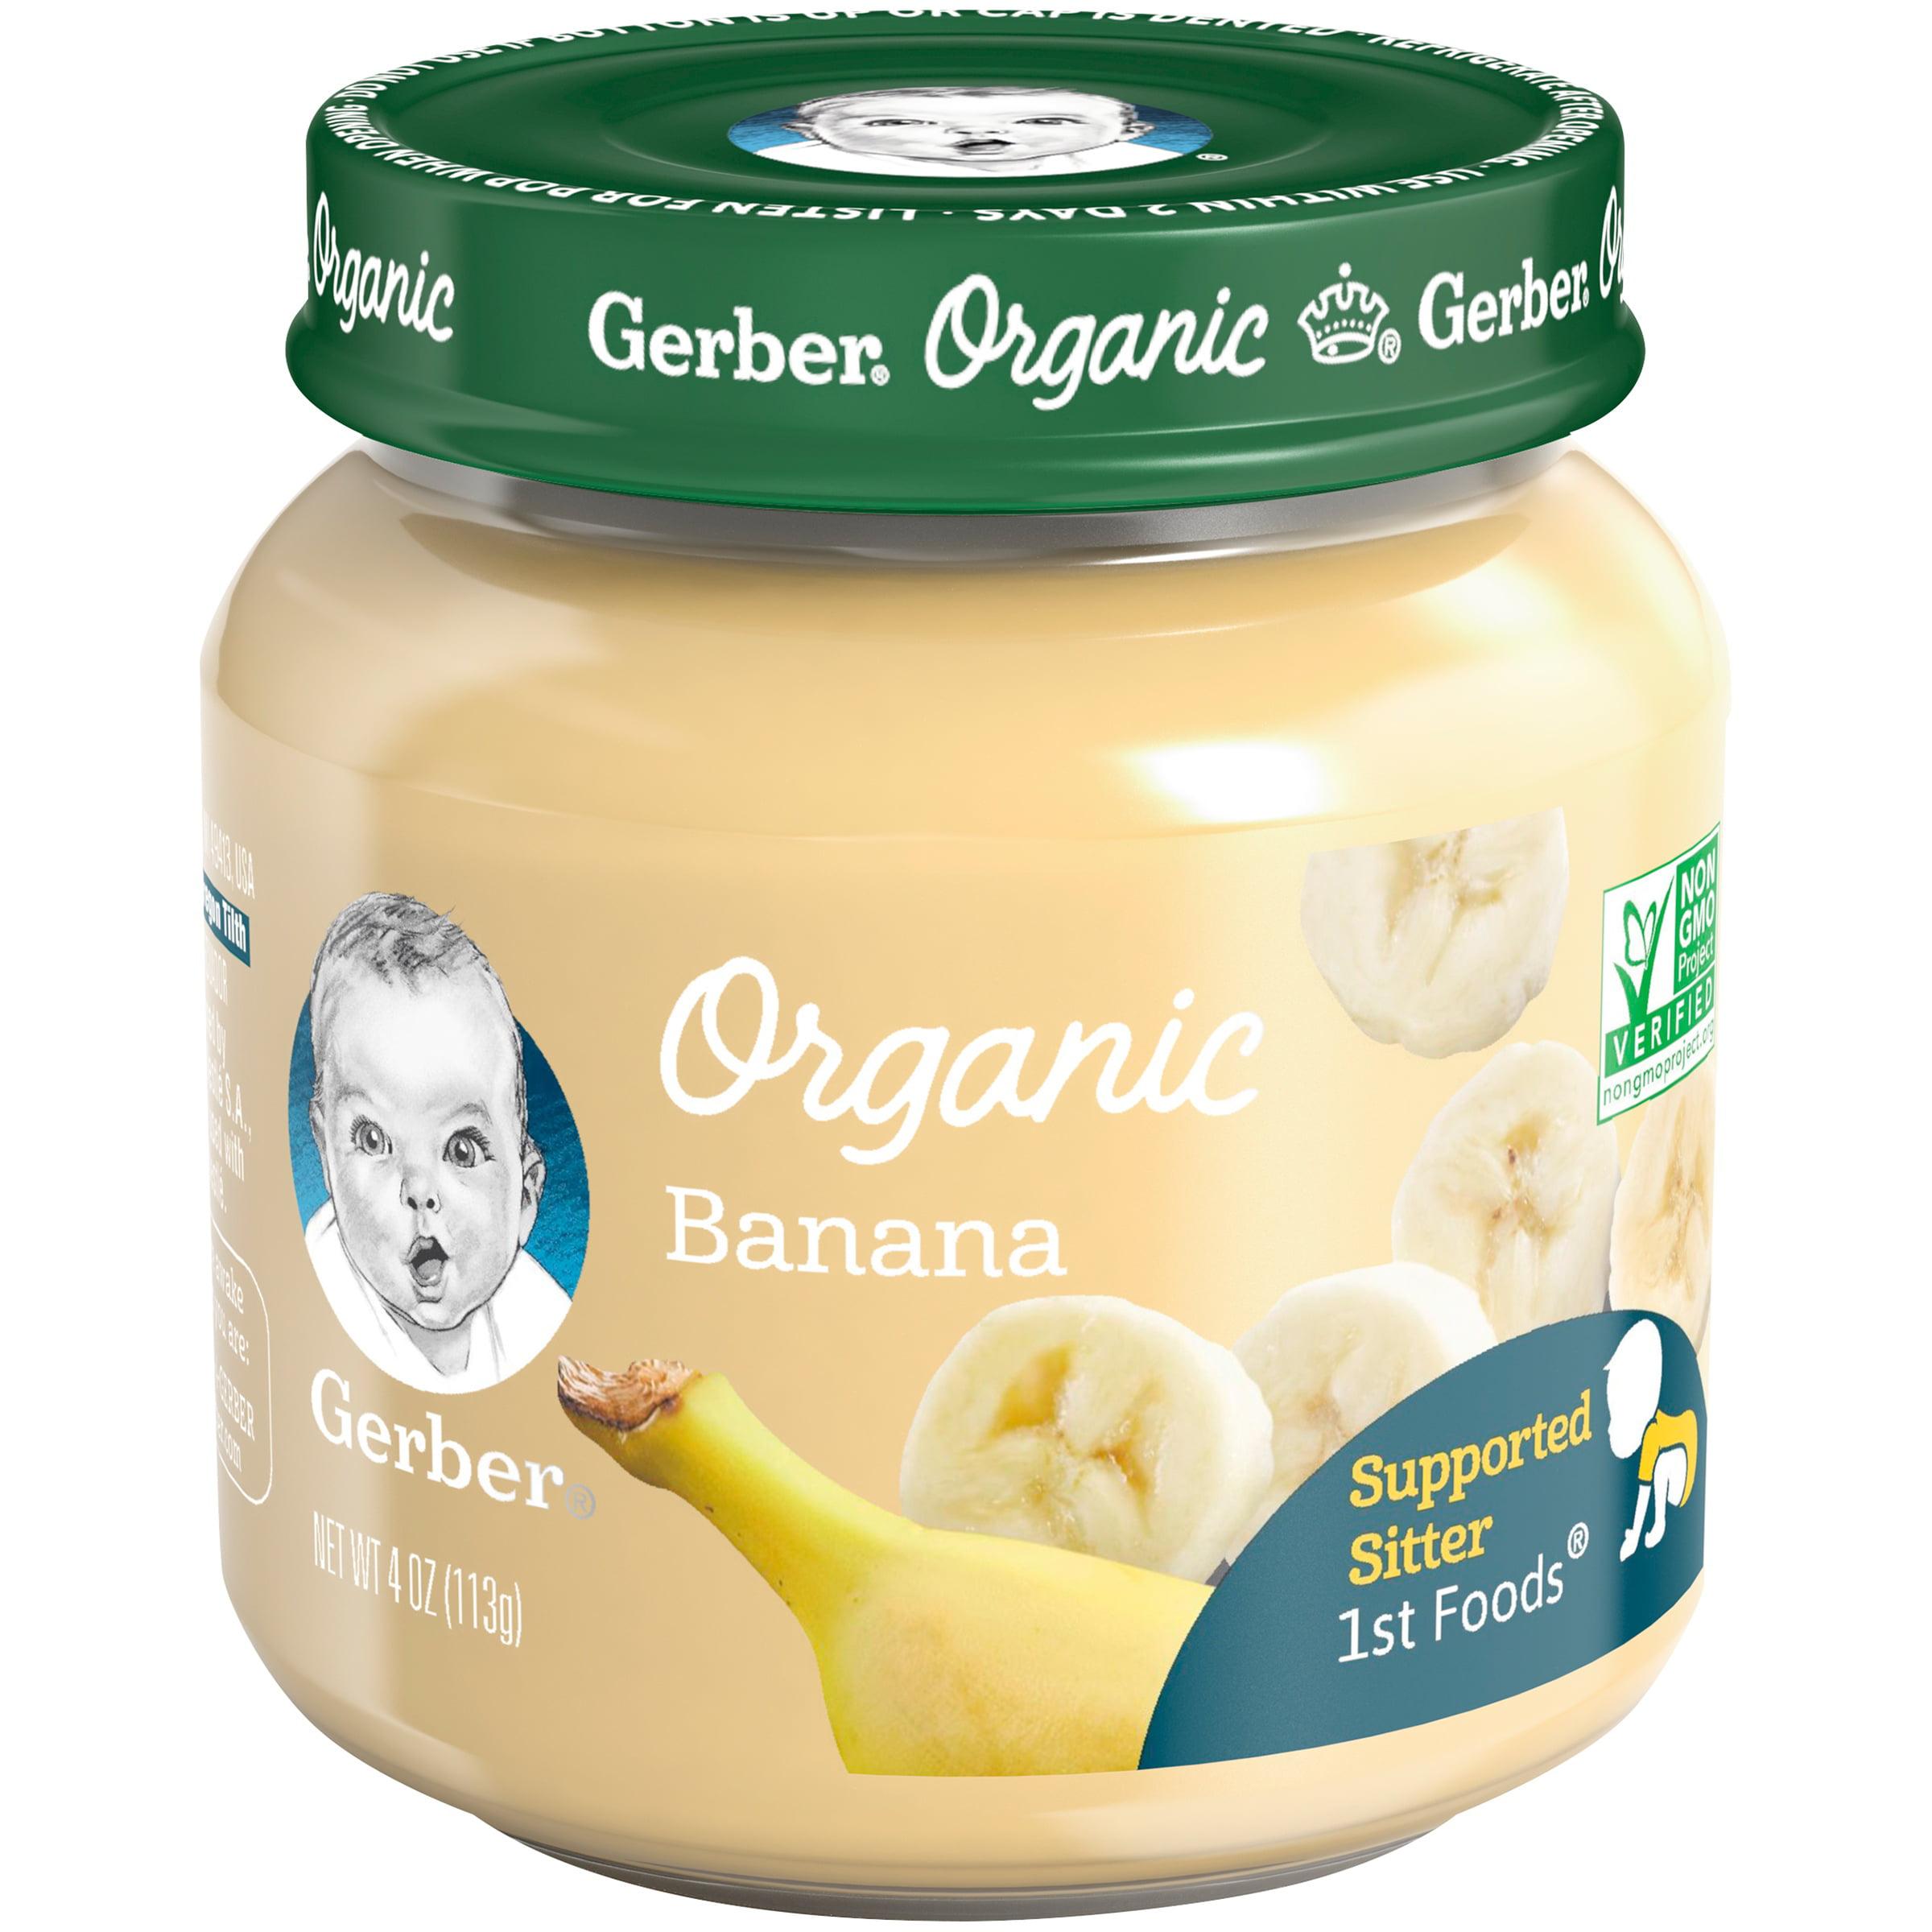 Gerber Organic 1st Foods Banana Baby Food, 4 oz. Glass Jar (Pack of 6)